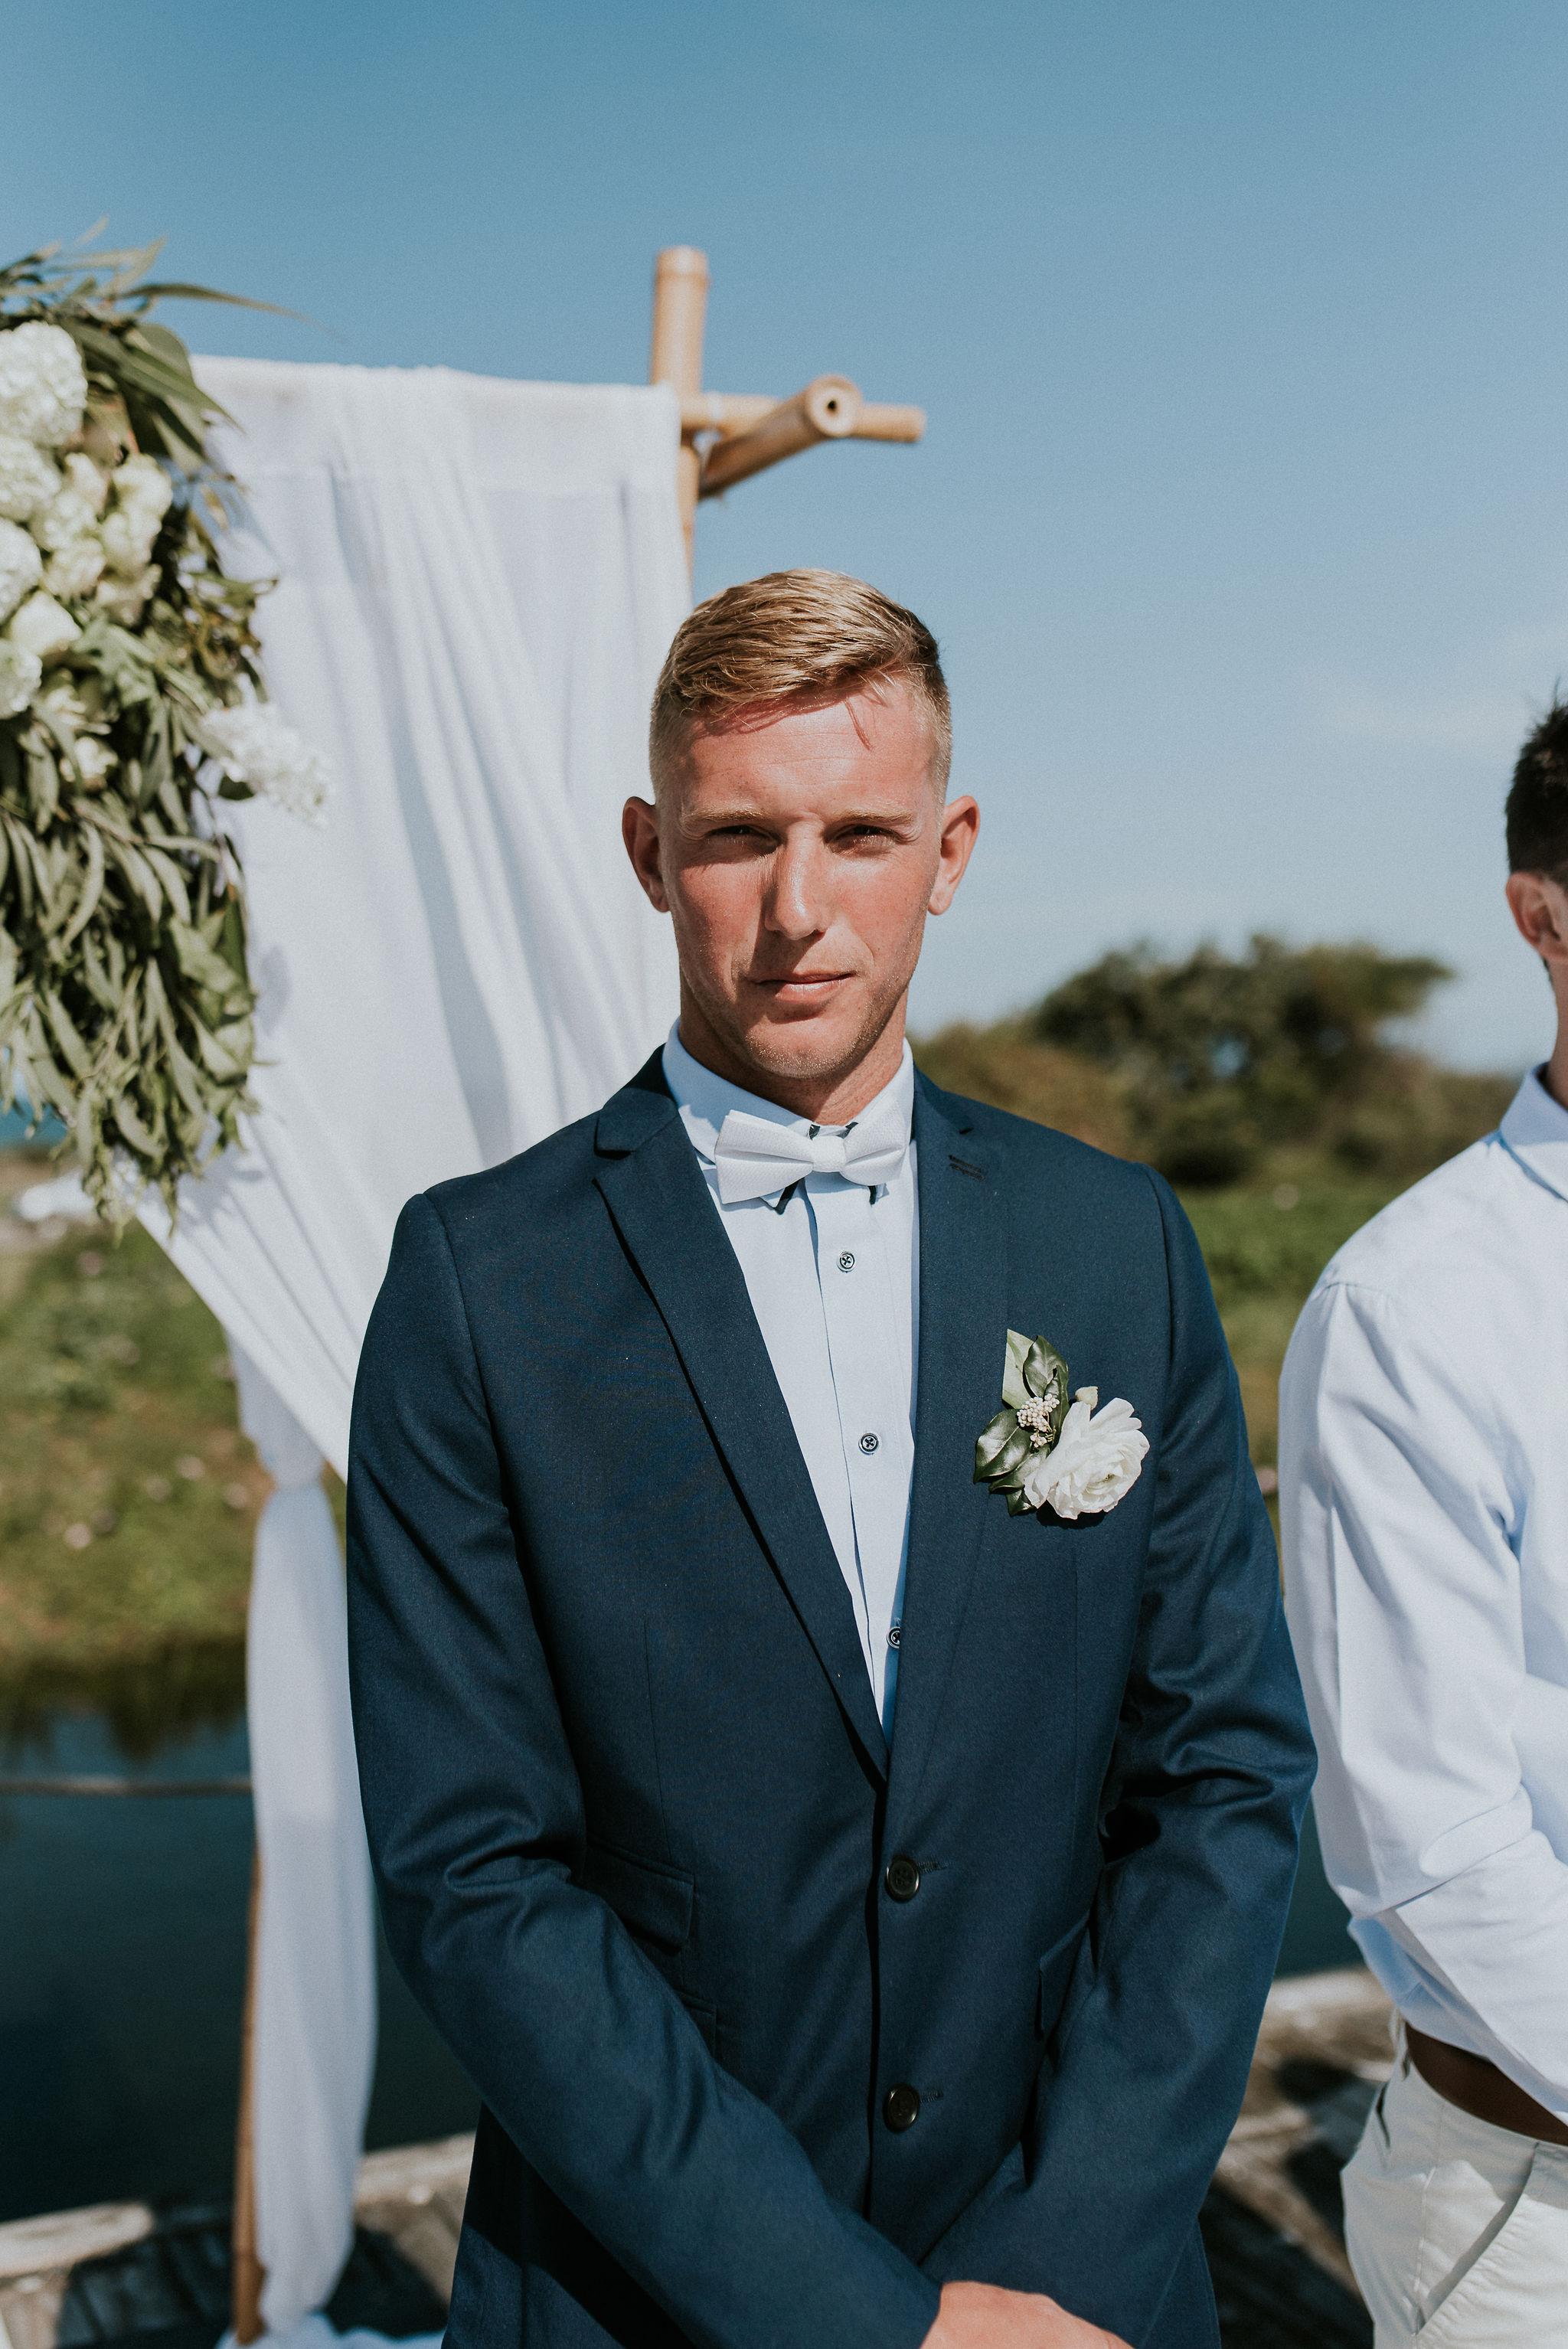 CAVES-BEACH-HOTEL-WEDDING-PATTEN-350.jpg